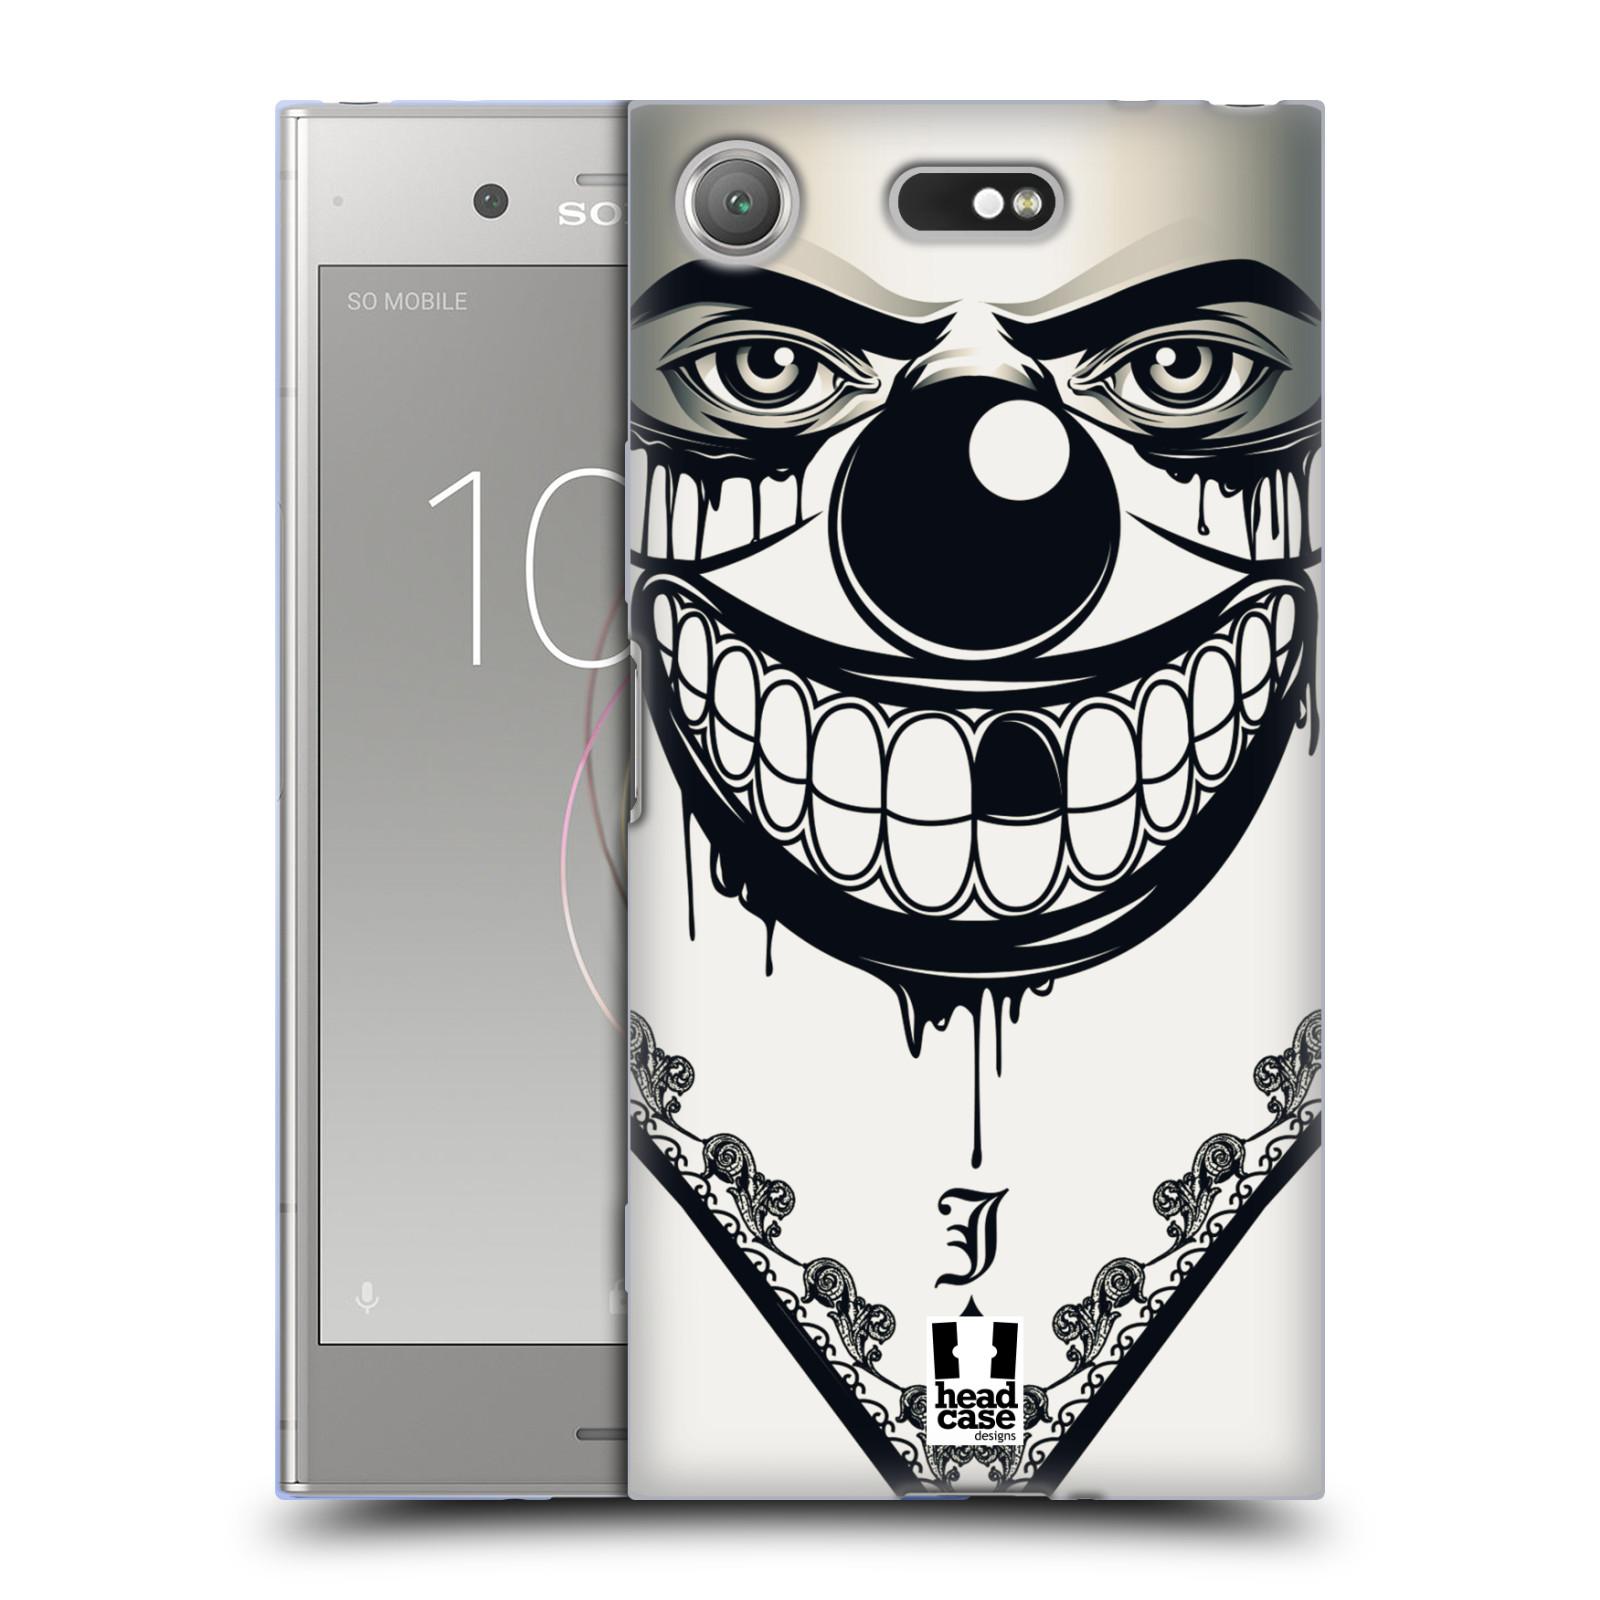 Silikonové pouzdro na mobil Sony Xperia XZ1 Compact - Head Case - ZLEJ KLAUN